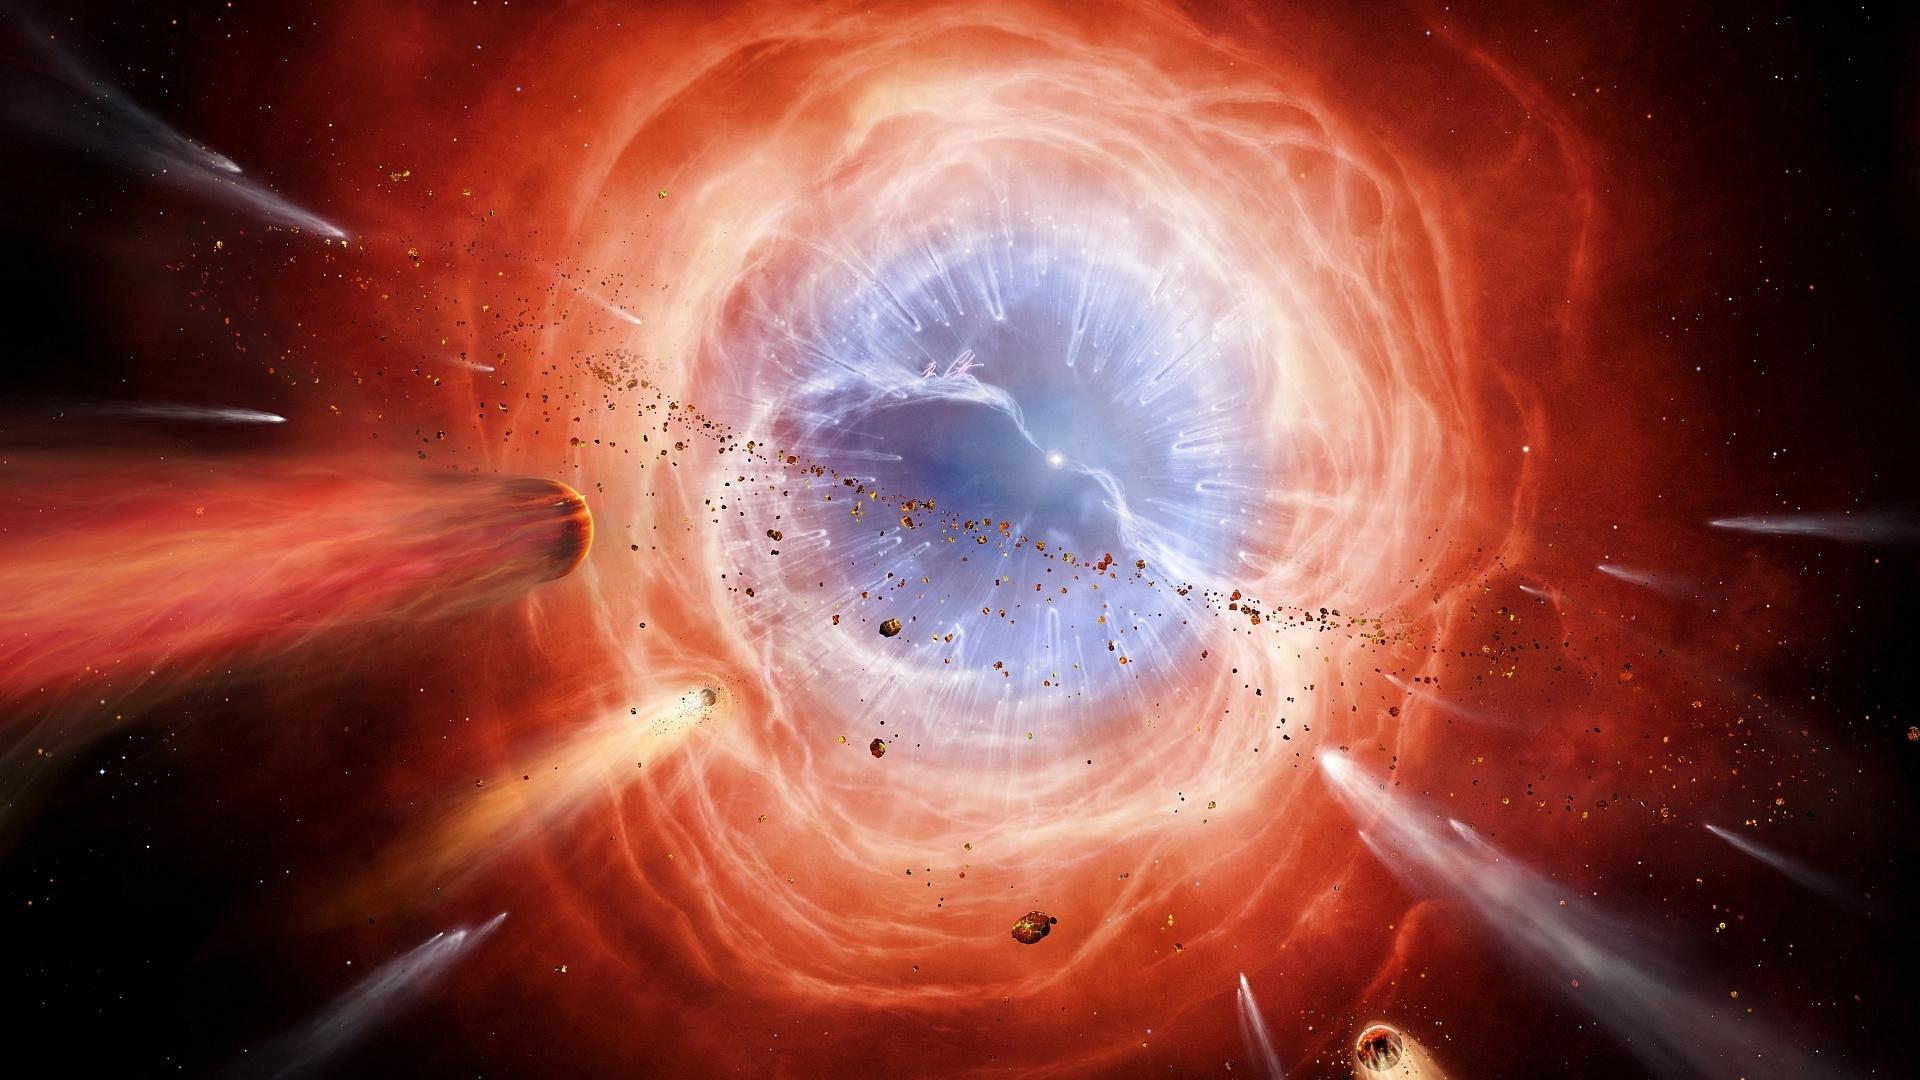 General 1920x1080 digital art minimalism black holes space comet planet